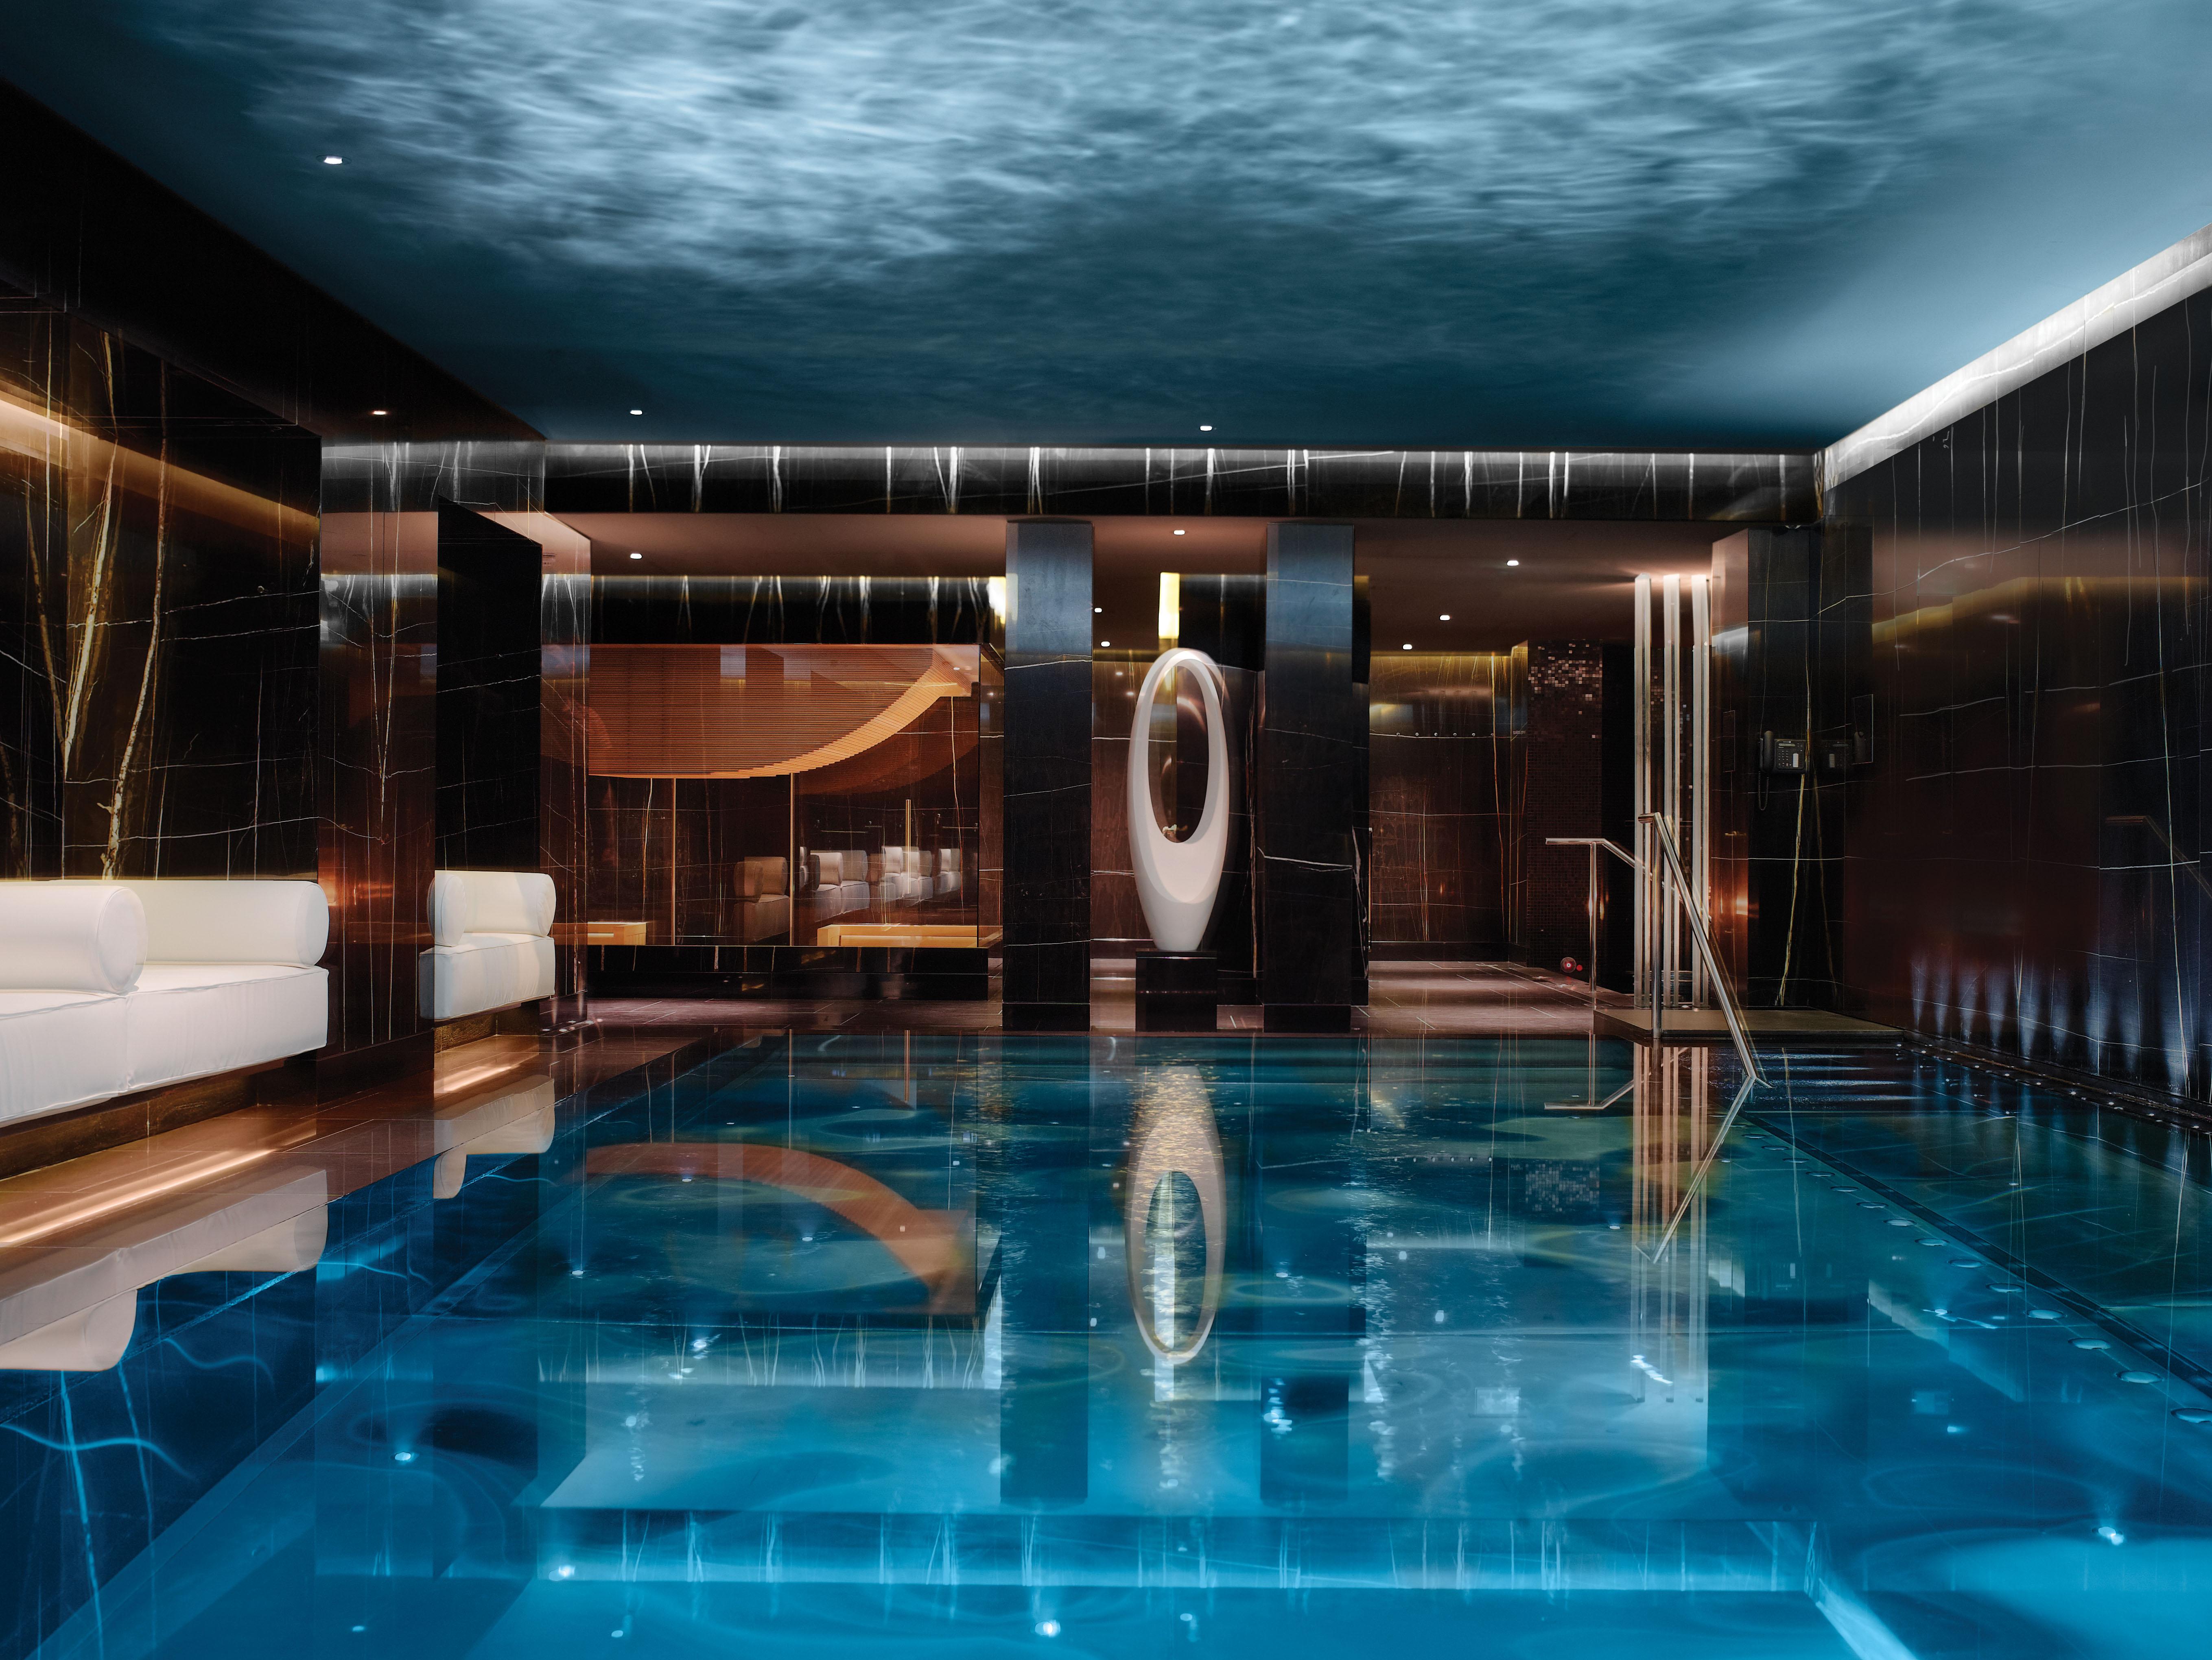 ESPA-Bank-On-It-London-Nil-Do-Simon-Fort-Lauderdale-Venice-Magazine